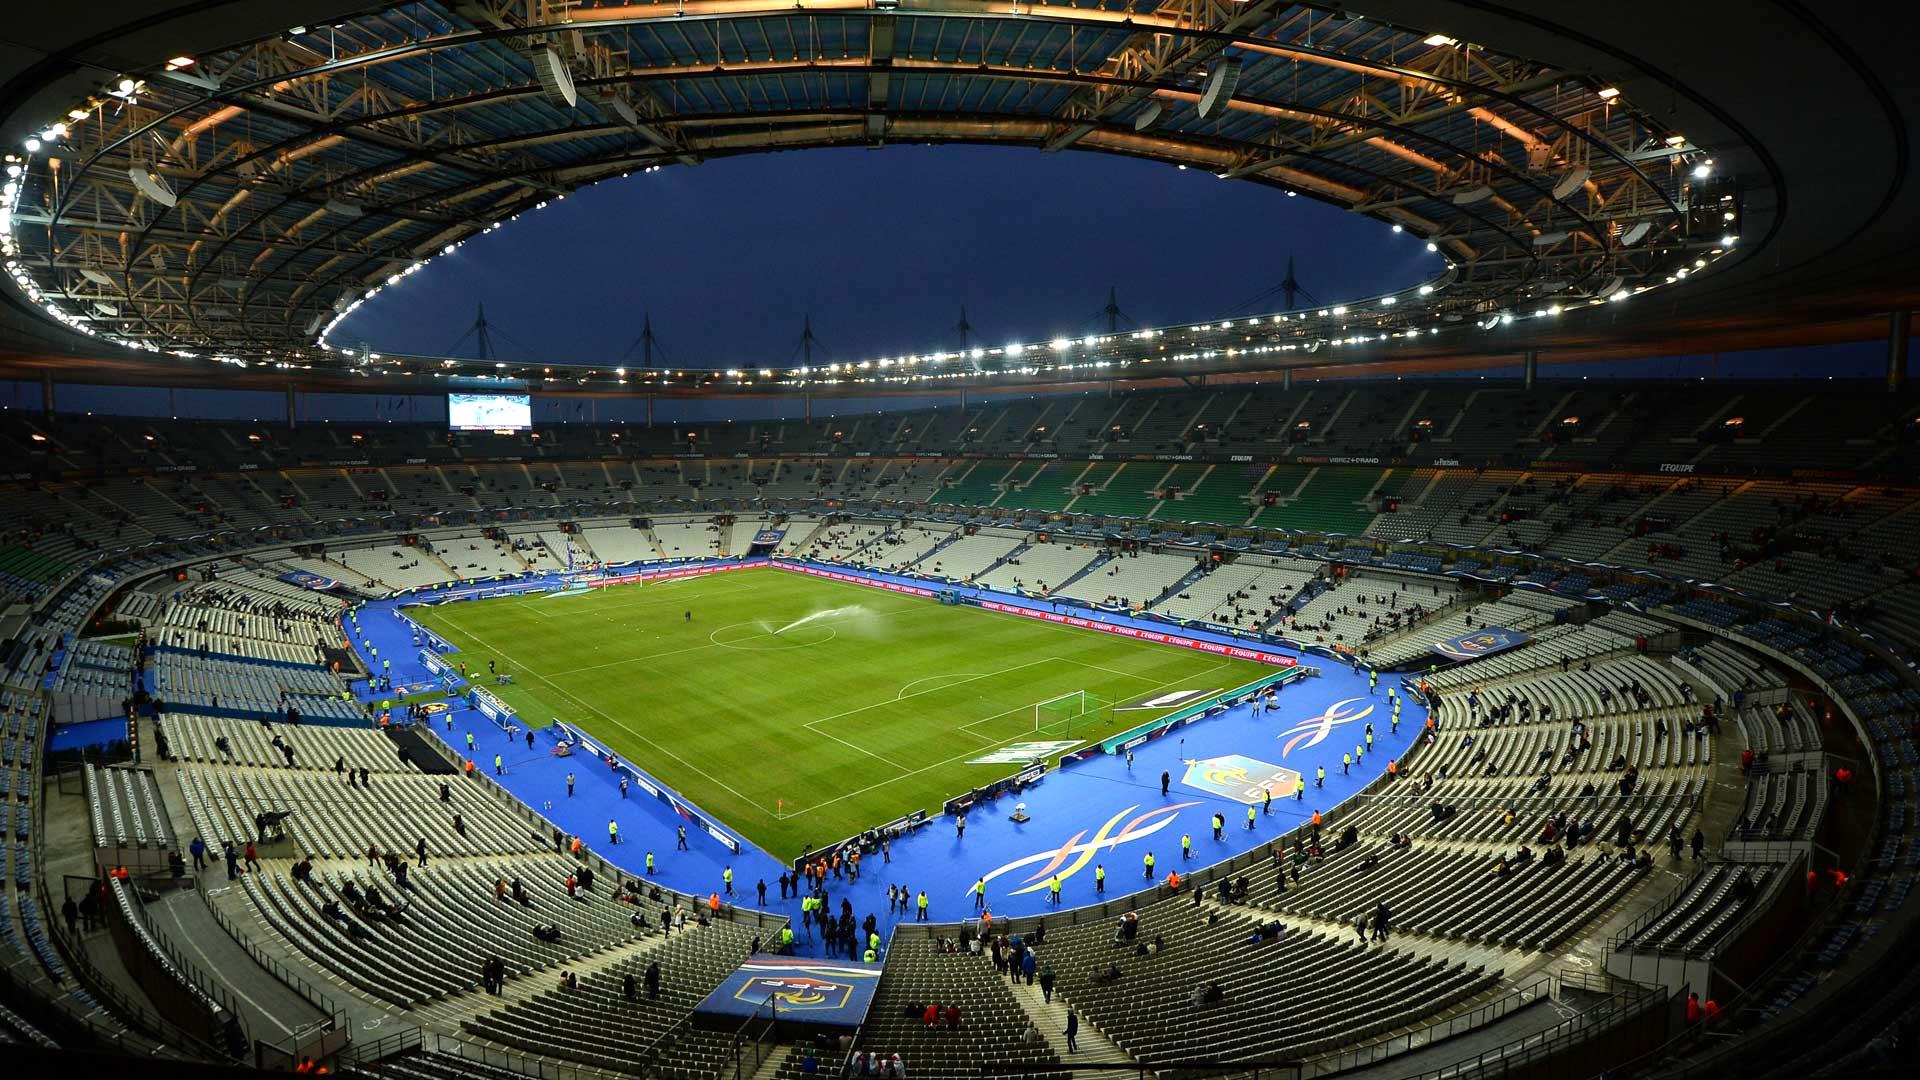 Stadium Soccer Football Sports Qhd Wallpaper 2560x2560: Fonds D'écran Paris, Stade, Nuit, France 1920x1080 Full HD